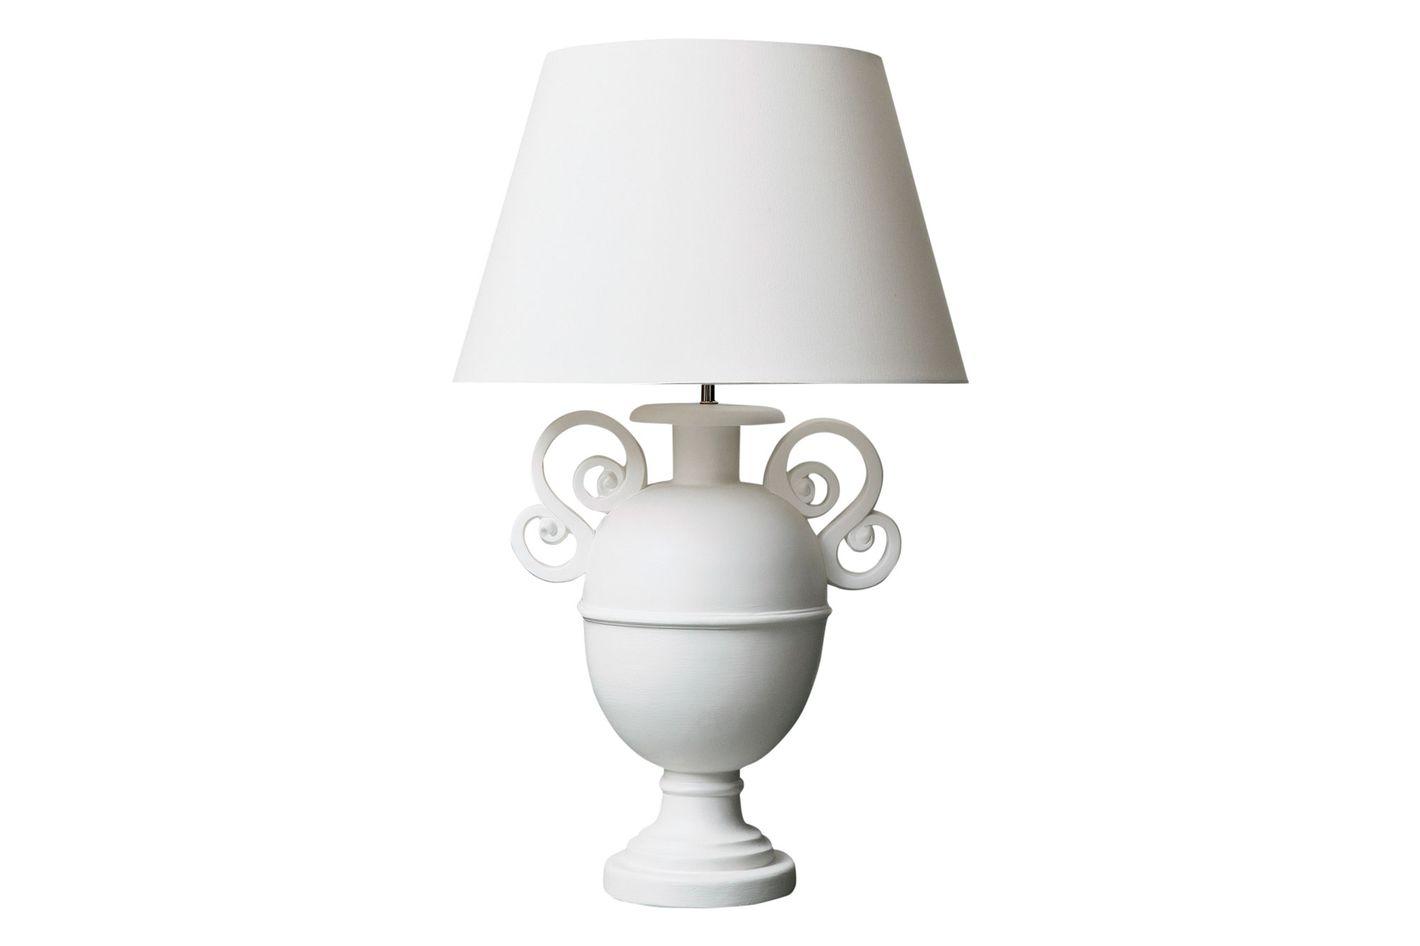 Liz O'Brien Editions urn lamp